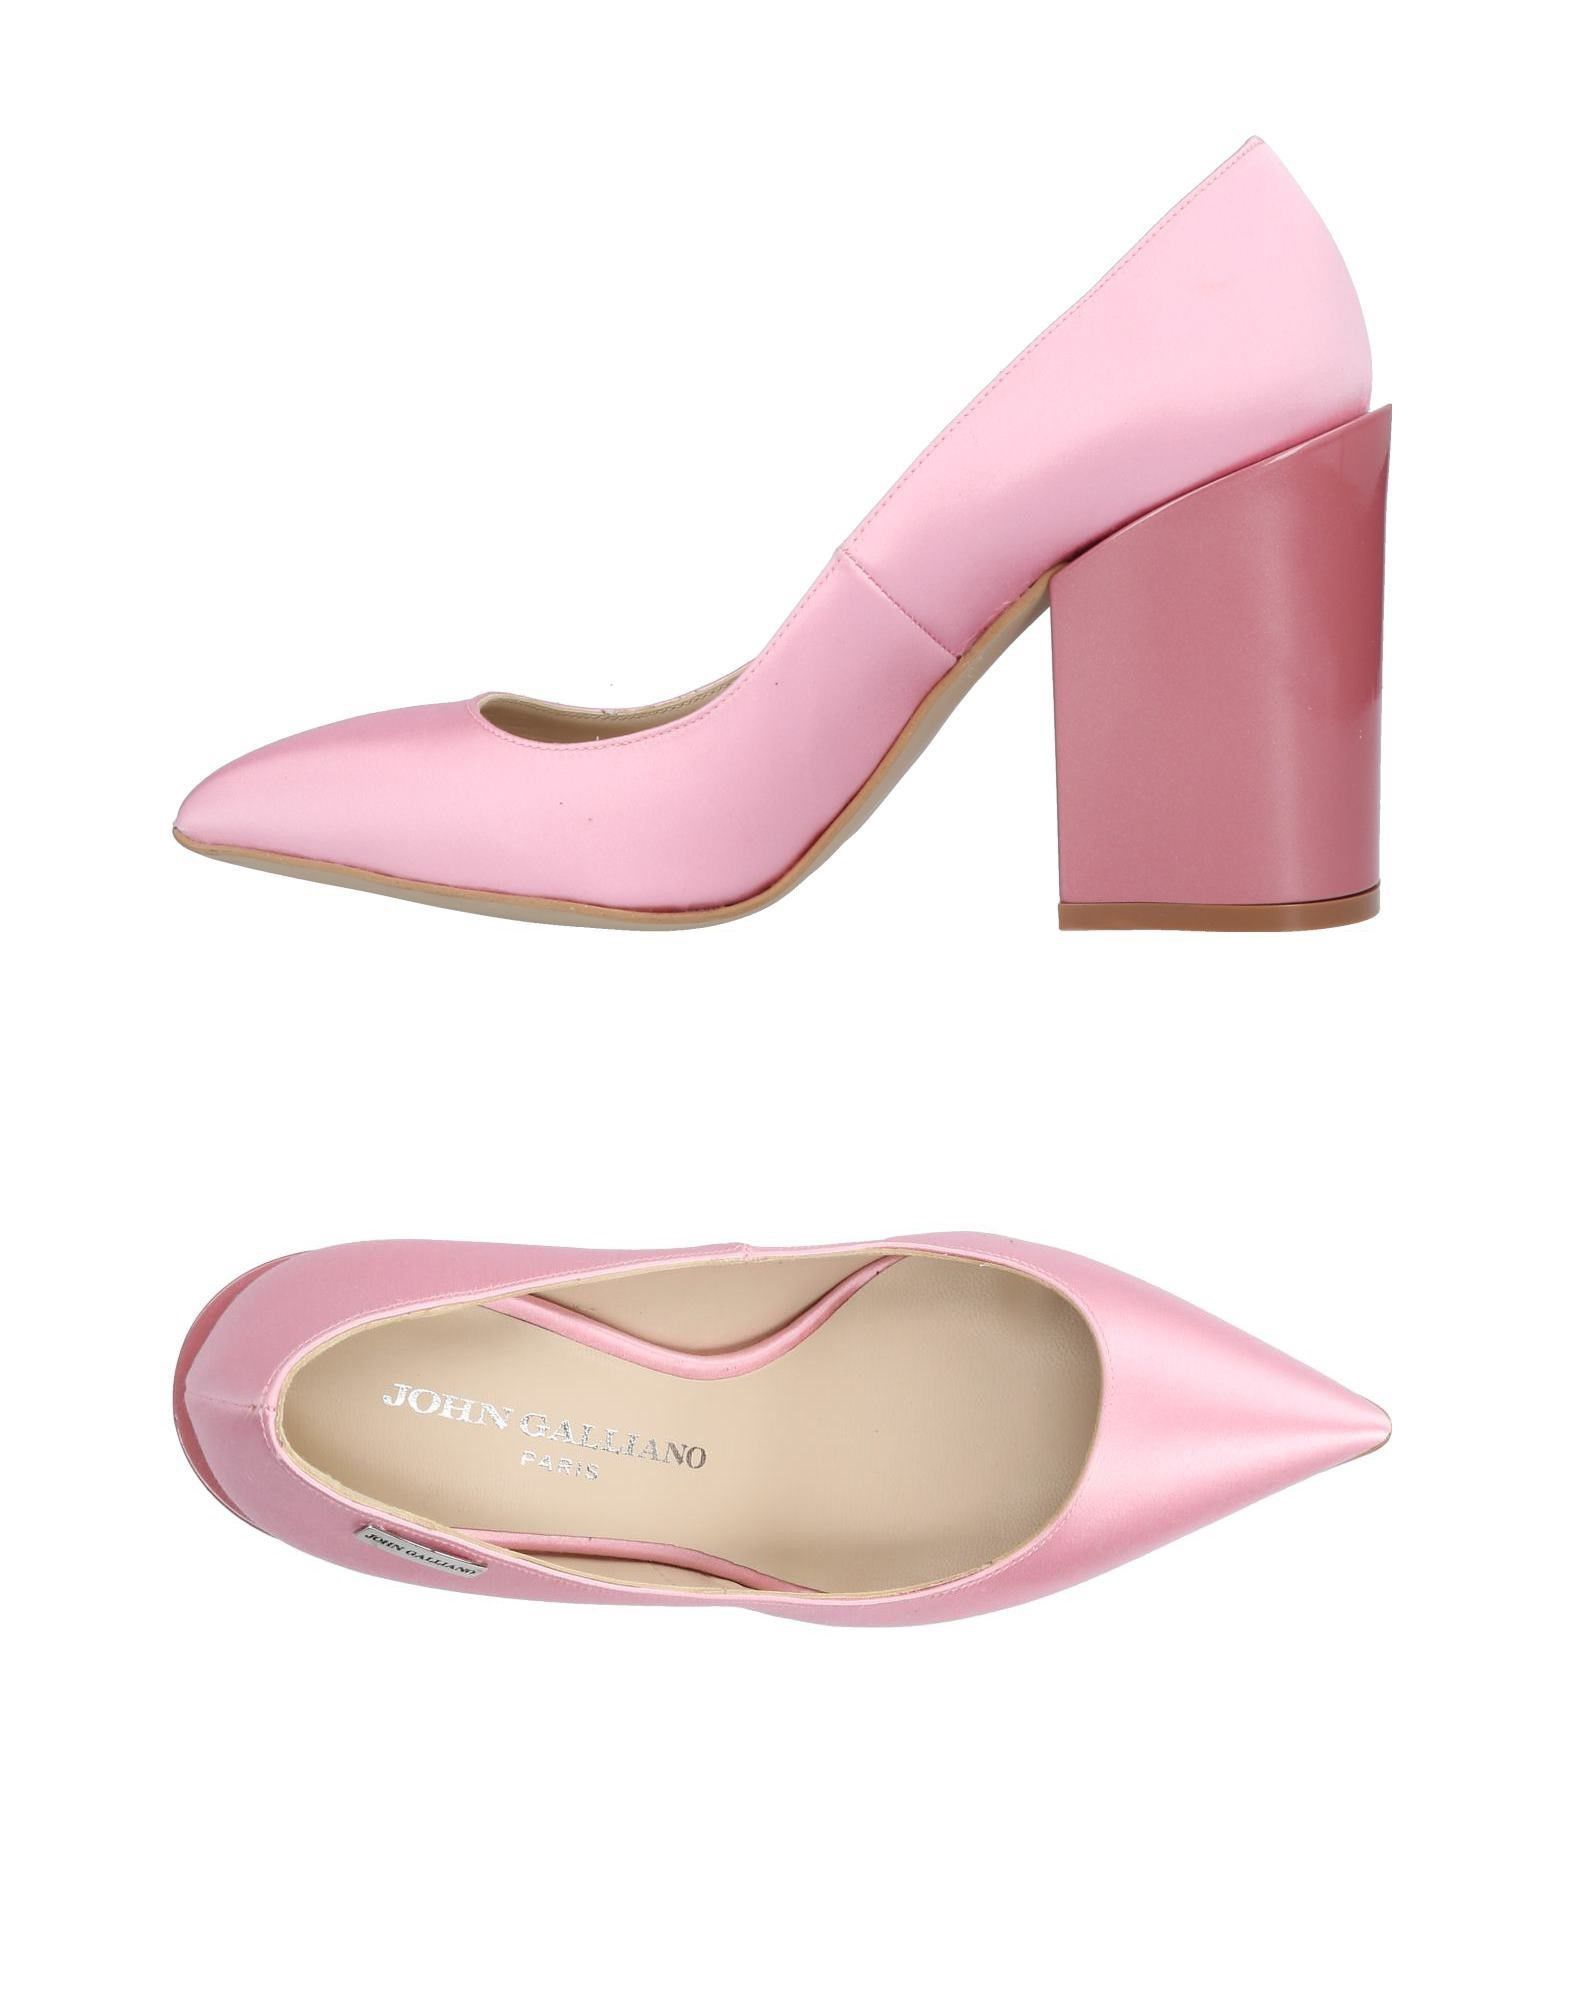 John Galliano Pink Leather Heels